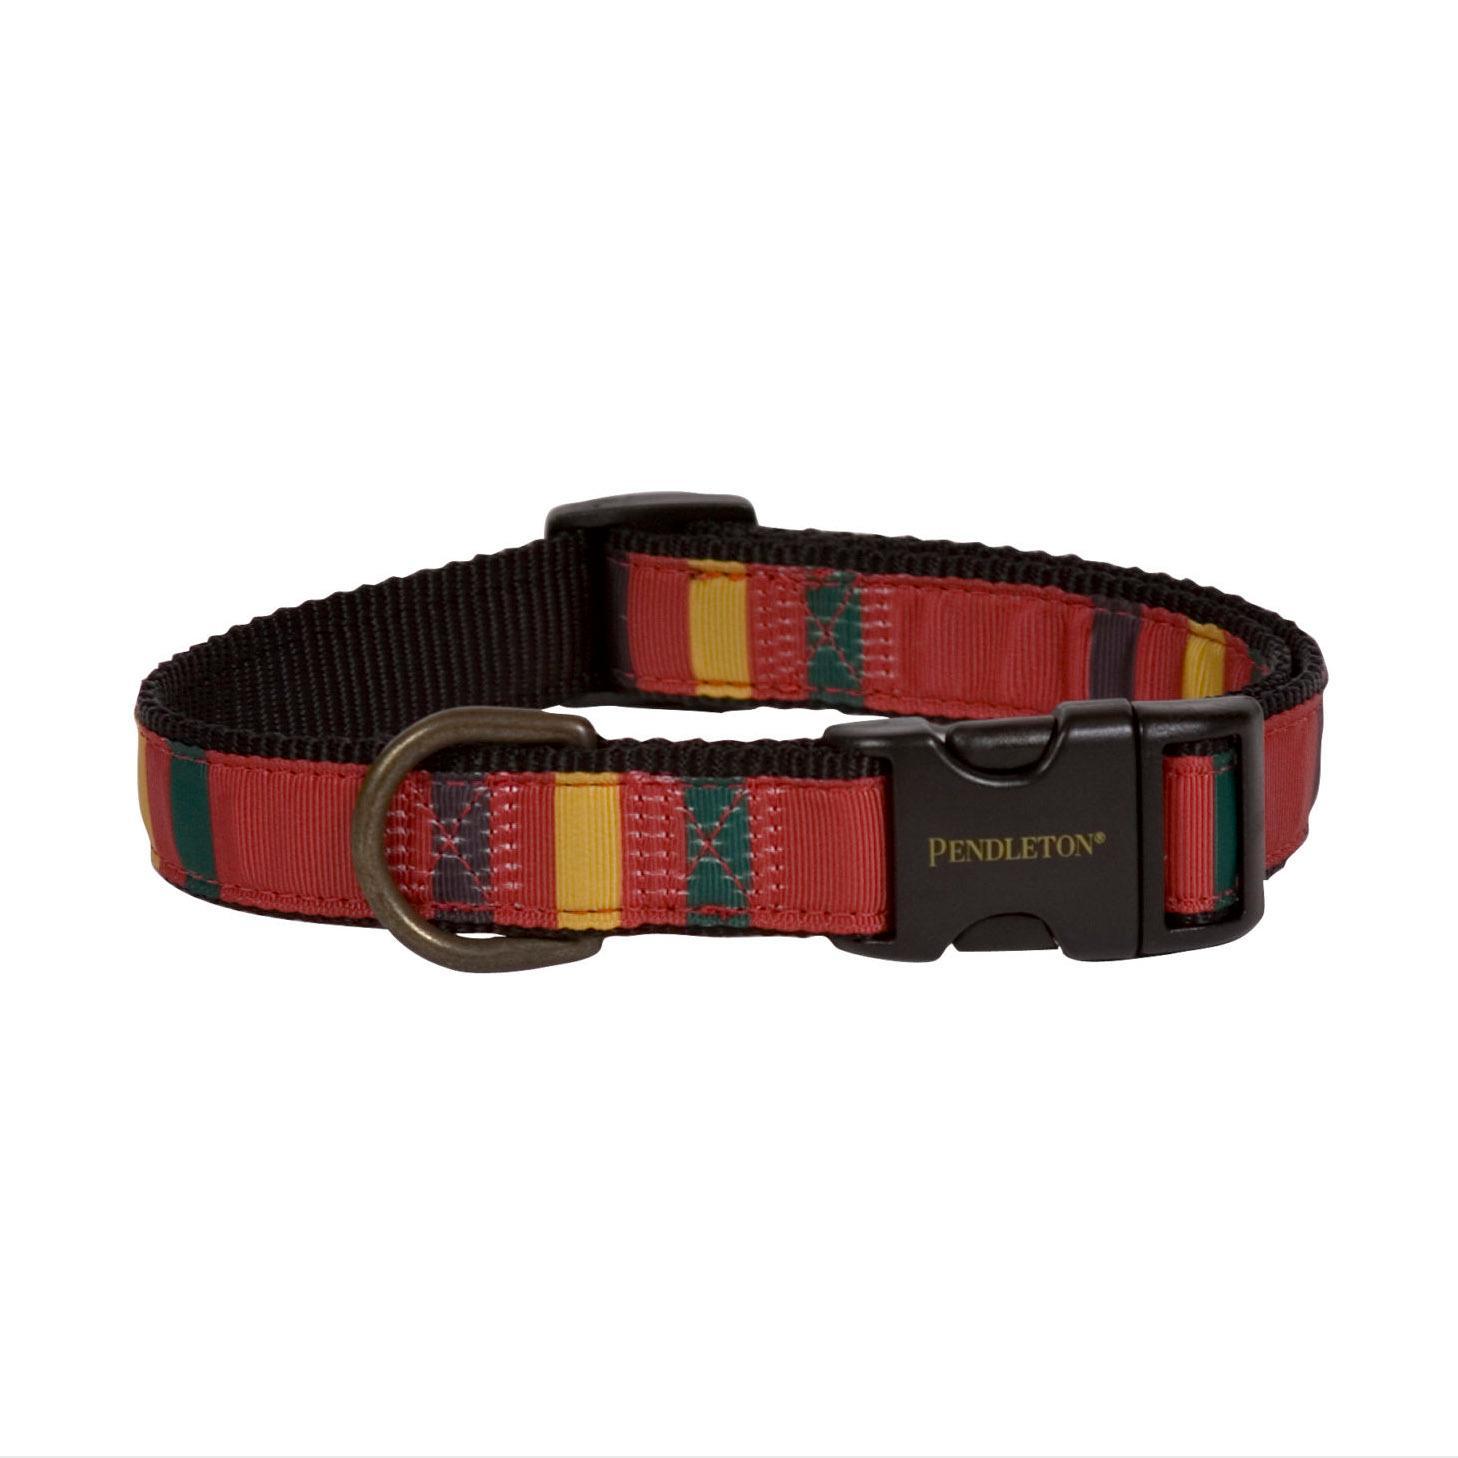 Pendleton Ranier National Park Hiker Dog Collar